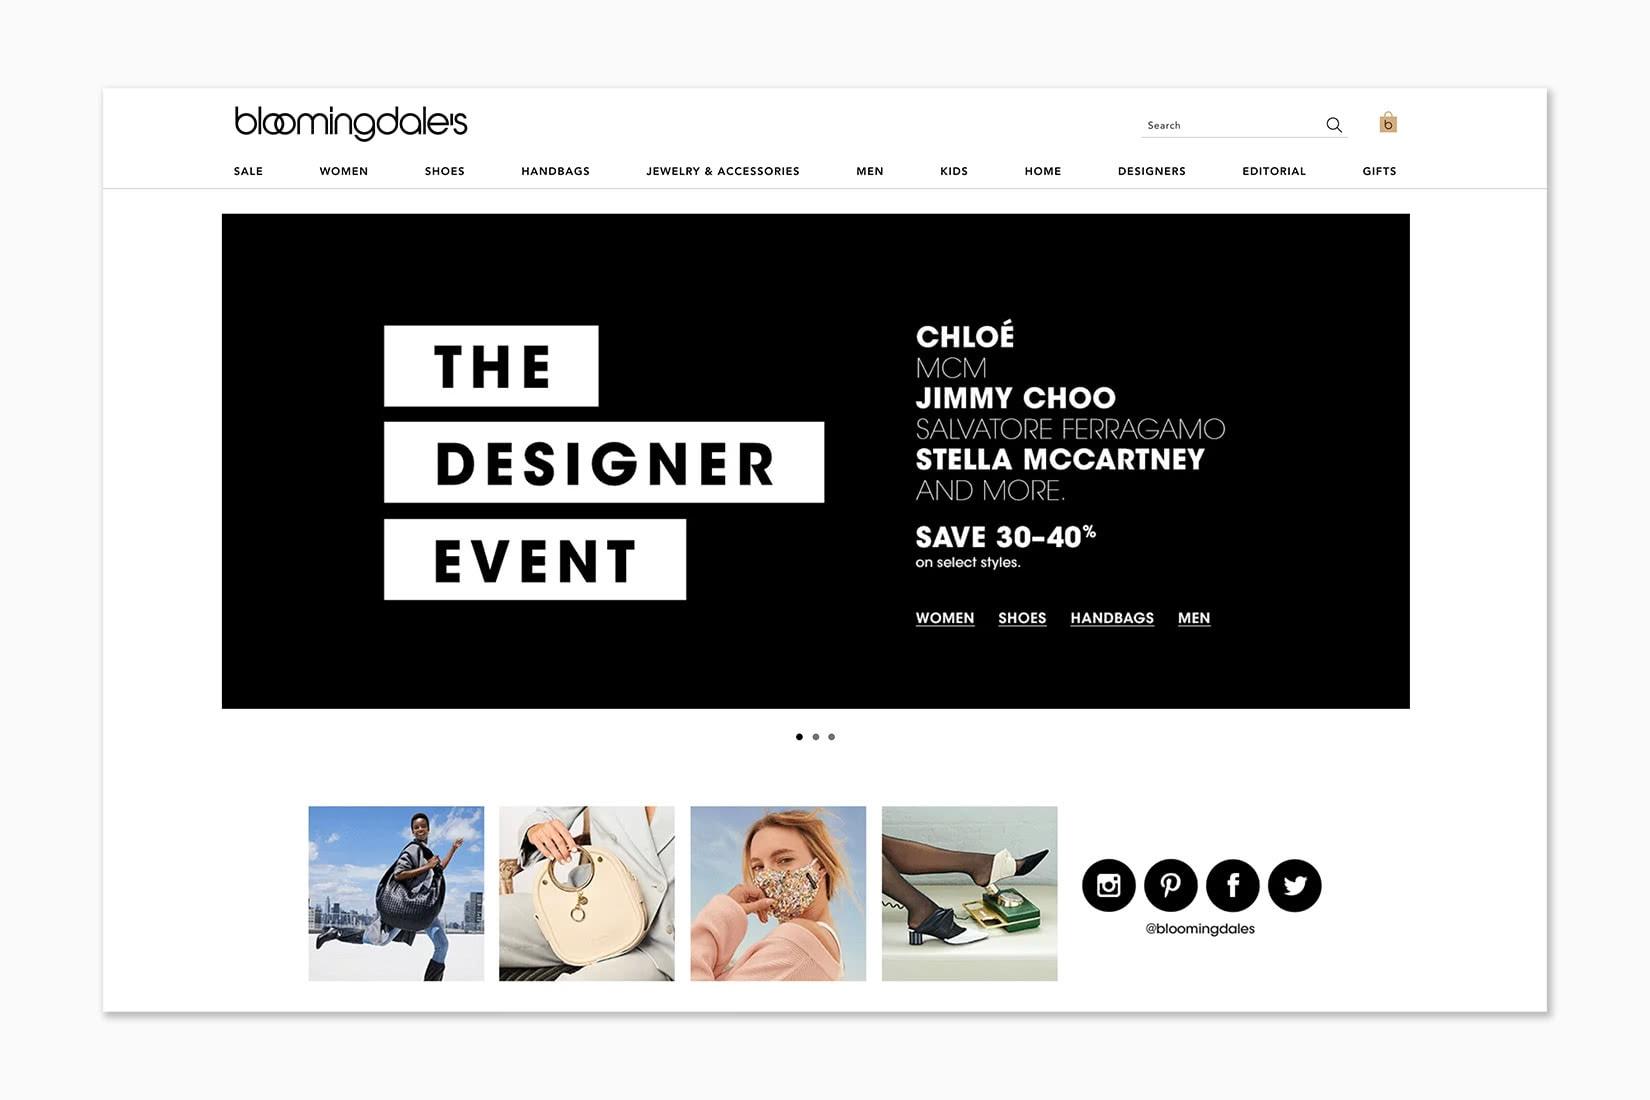 best online shopping sites women bloomingdale's - Luxe Digital